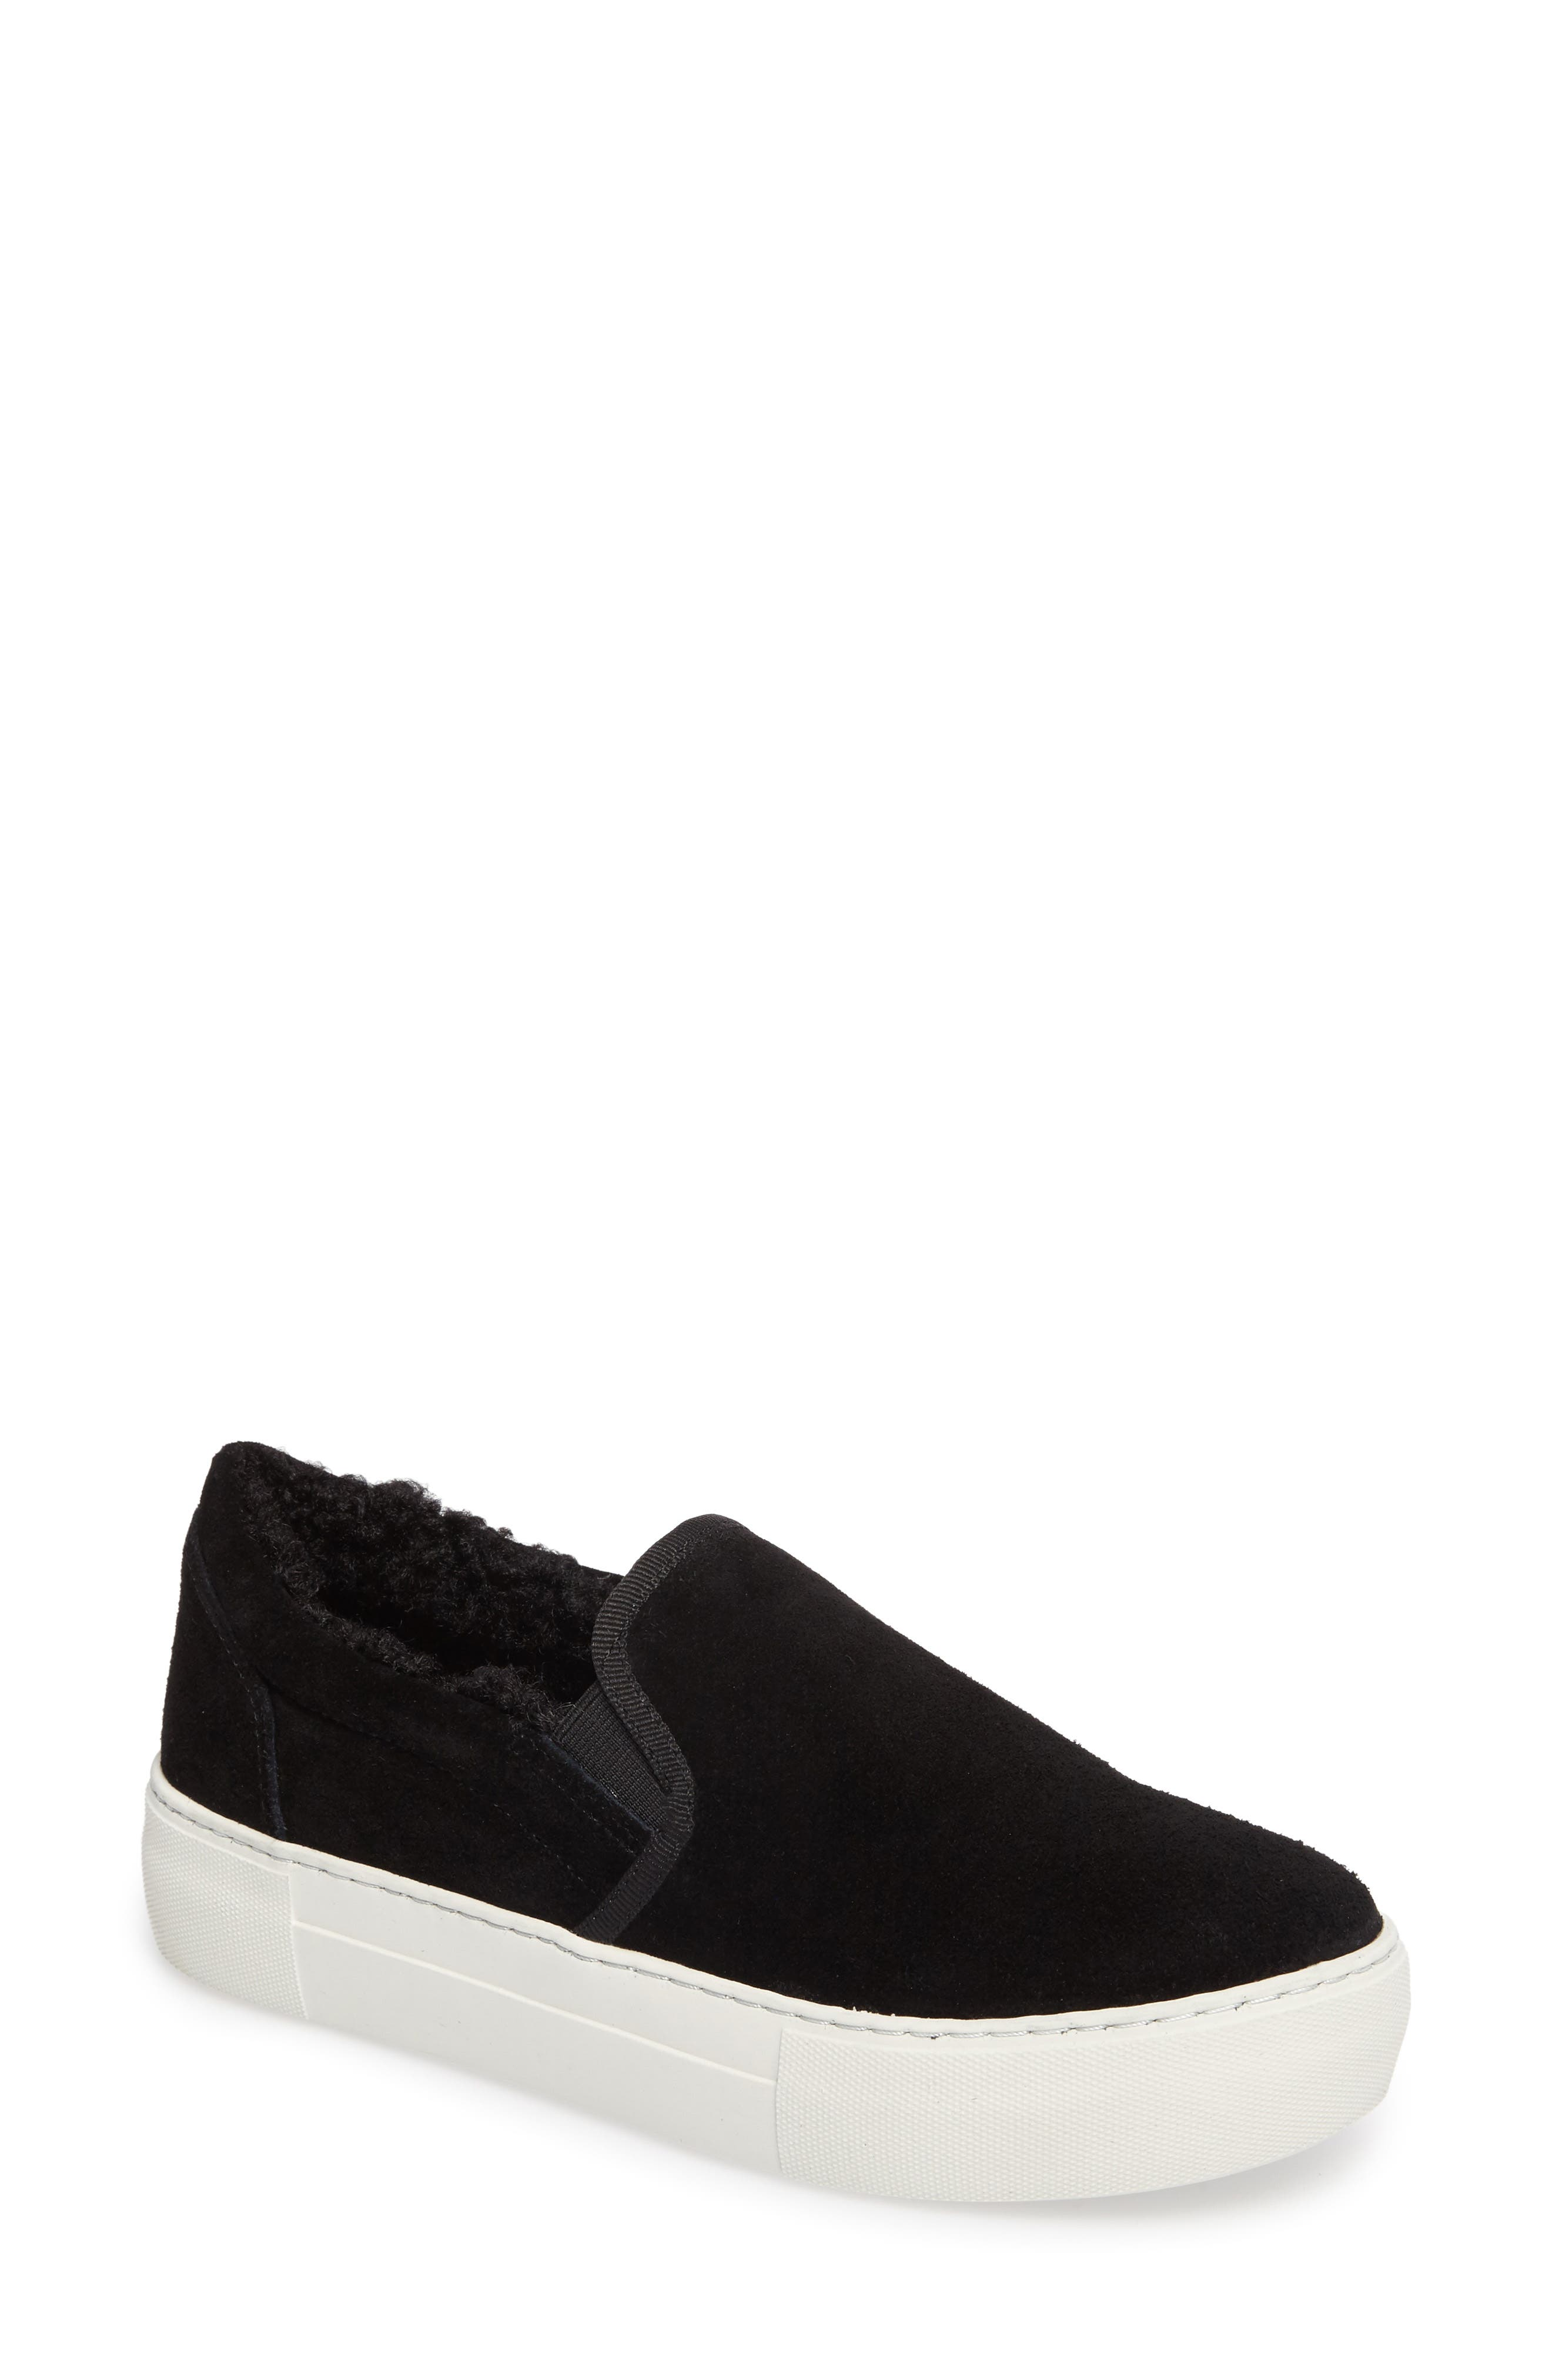 Arpel Faux Fur Lined Slip-On Sneaker,                         Main,                         color, Black Suede